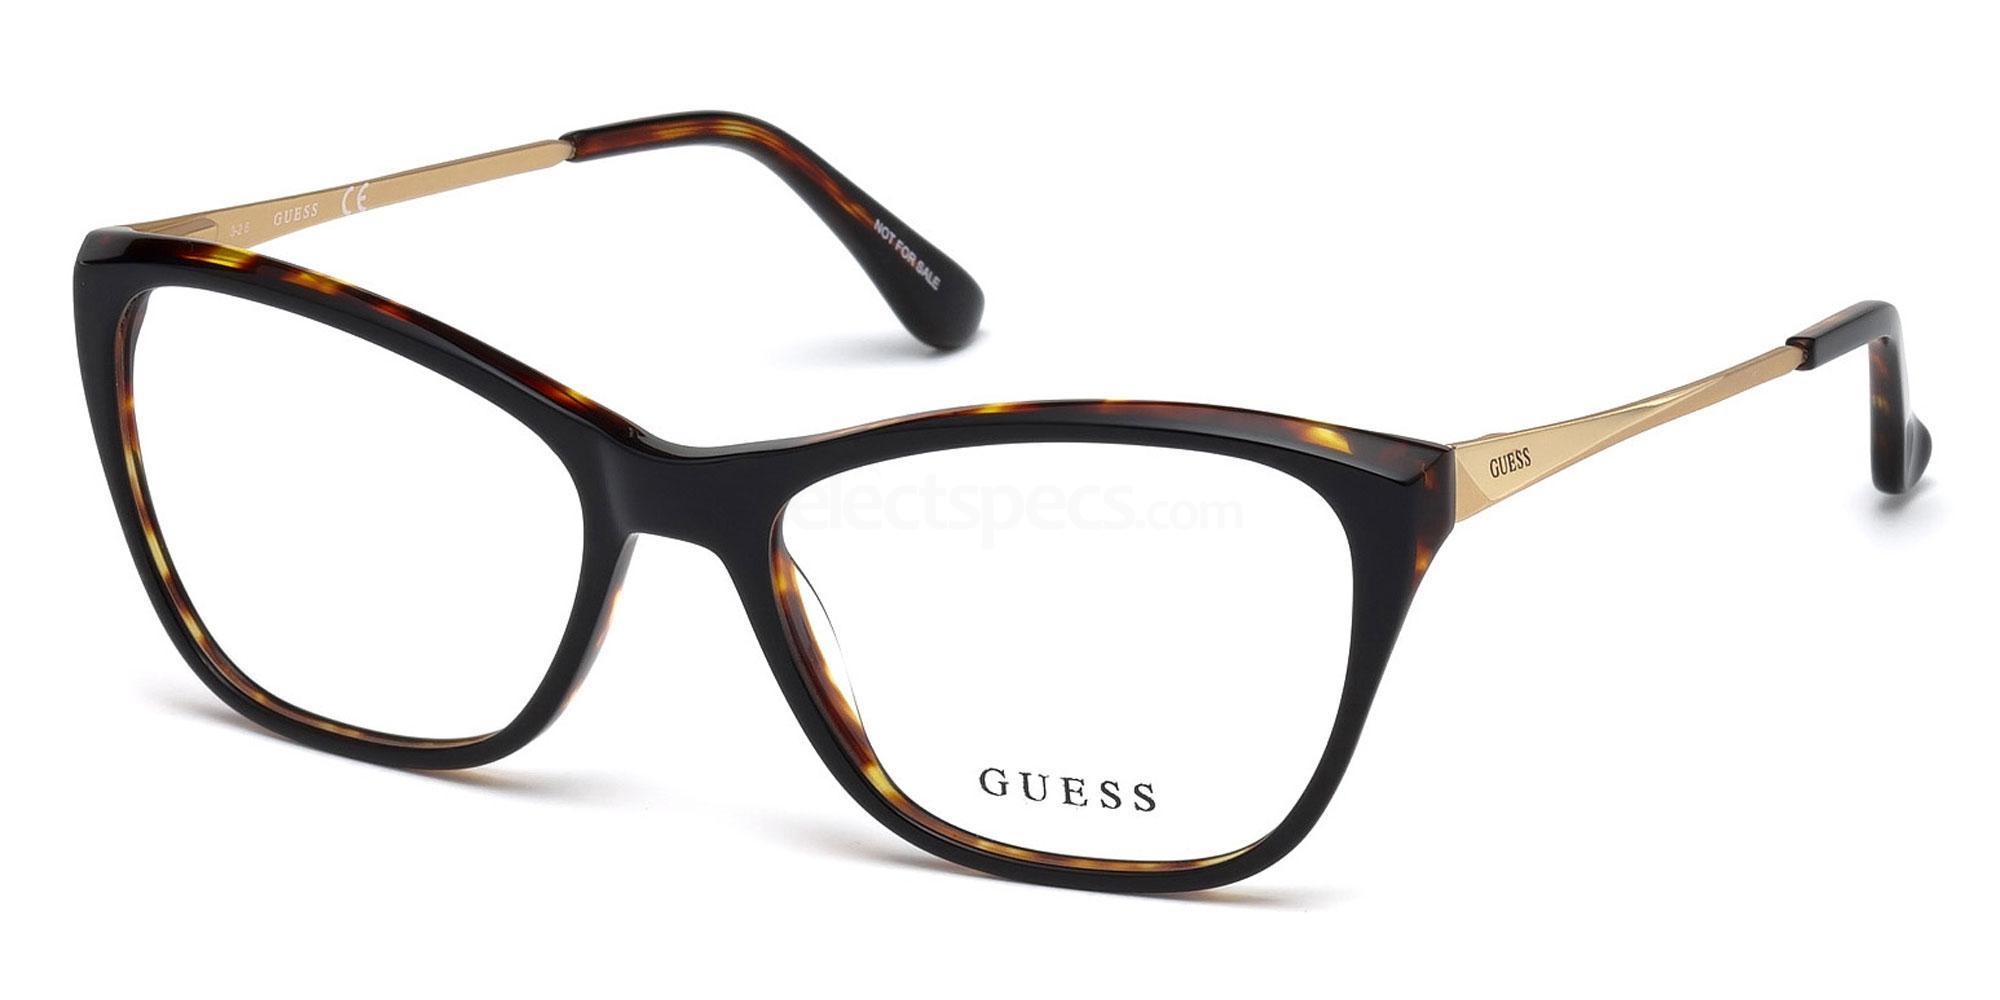 001 GU2604 Glasses, Guess